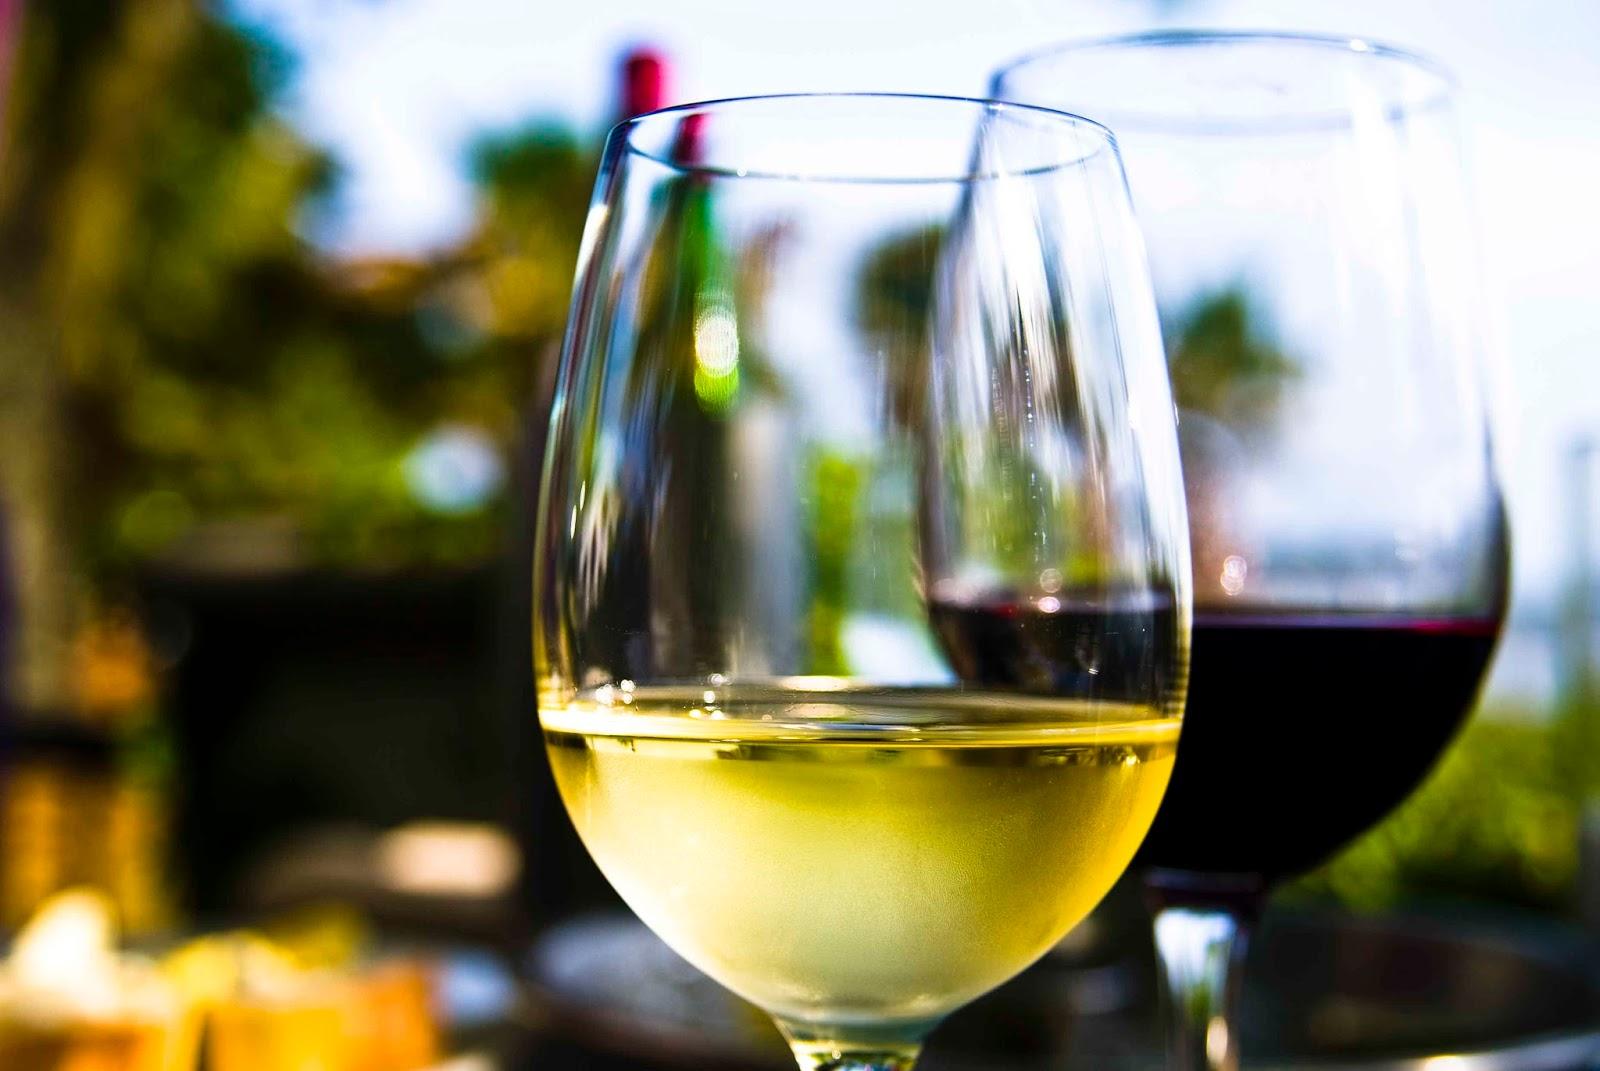 Choosing The Best Wine For The Season